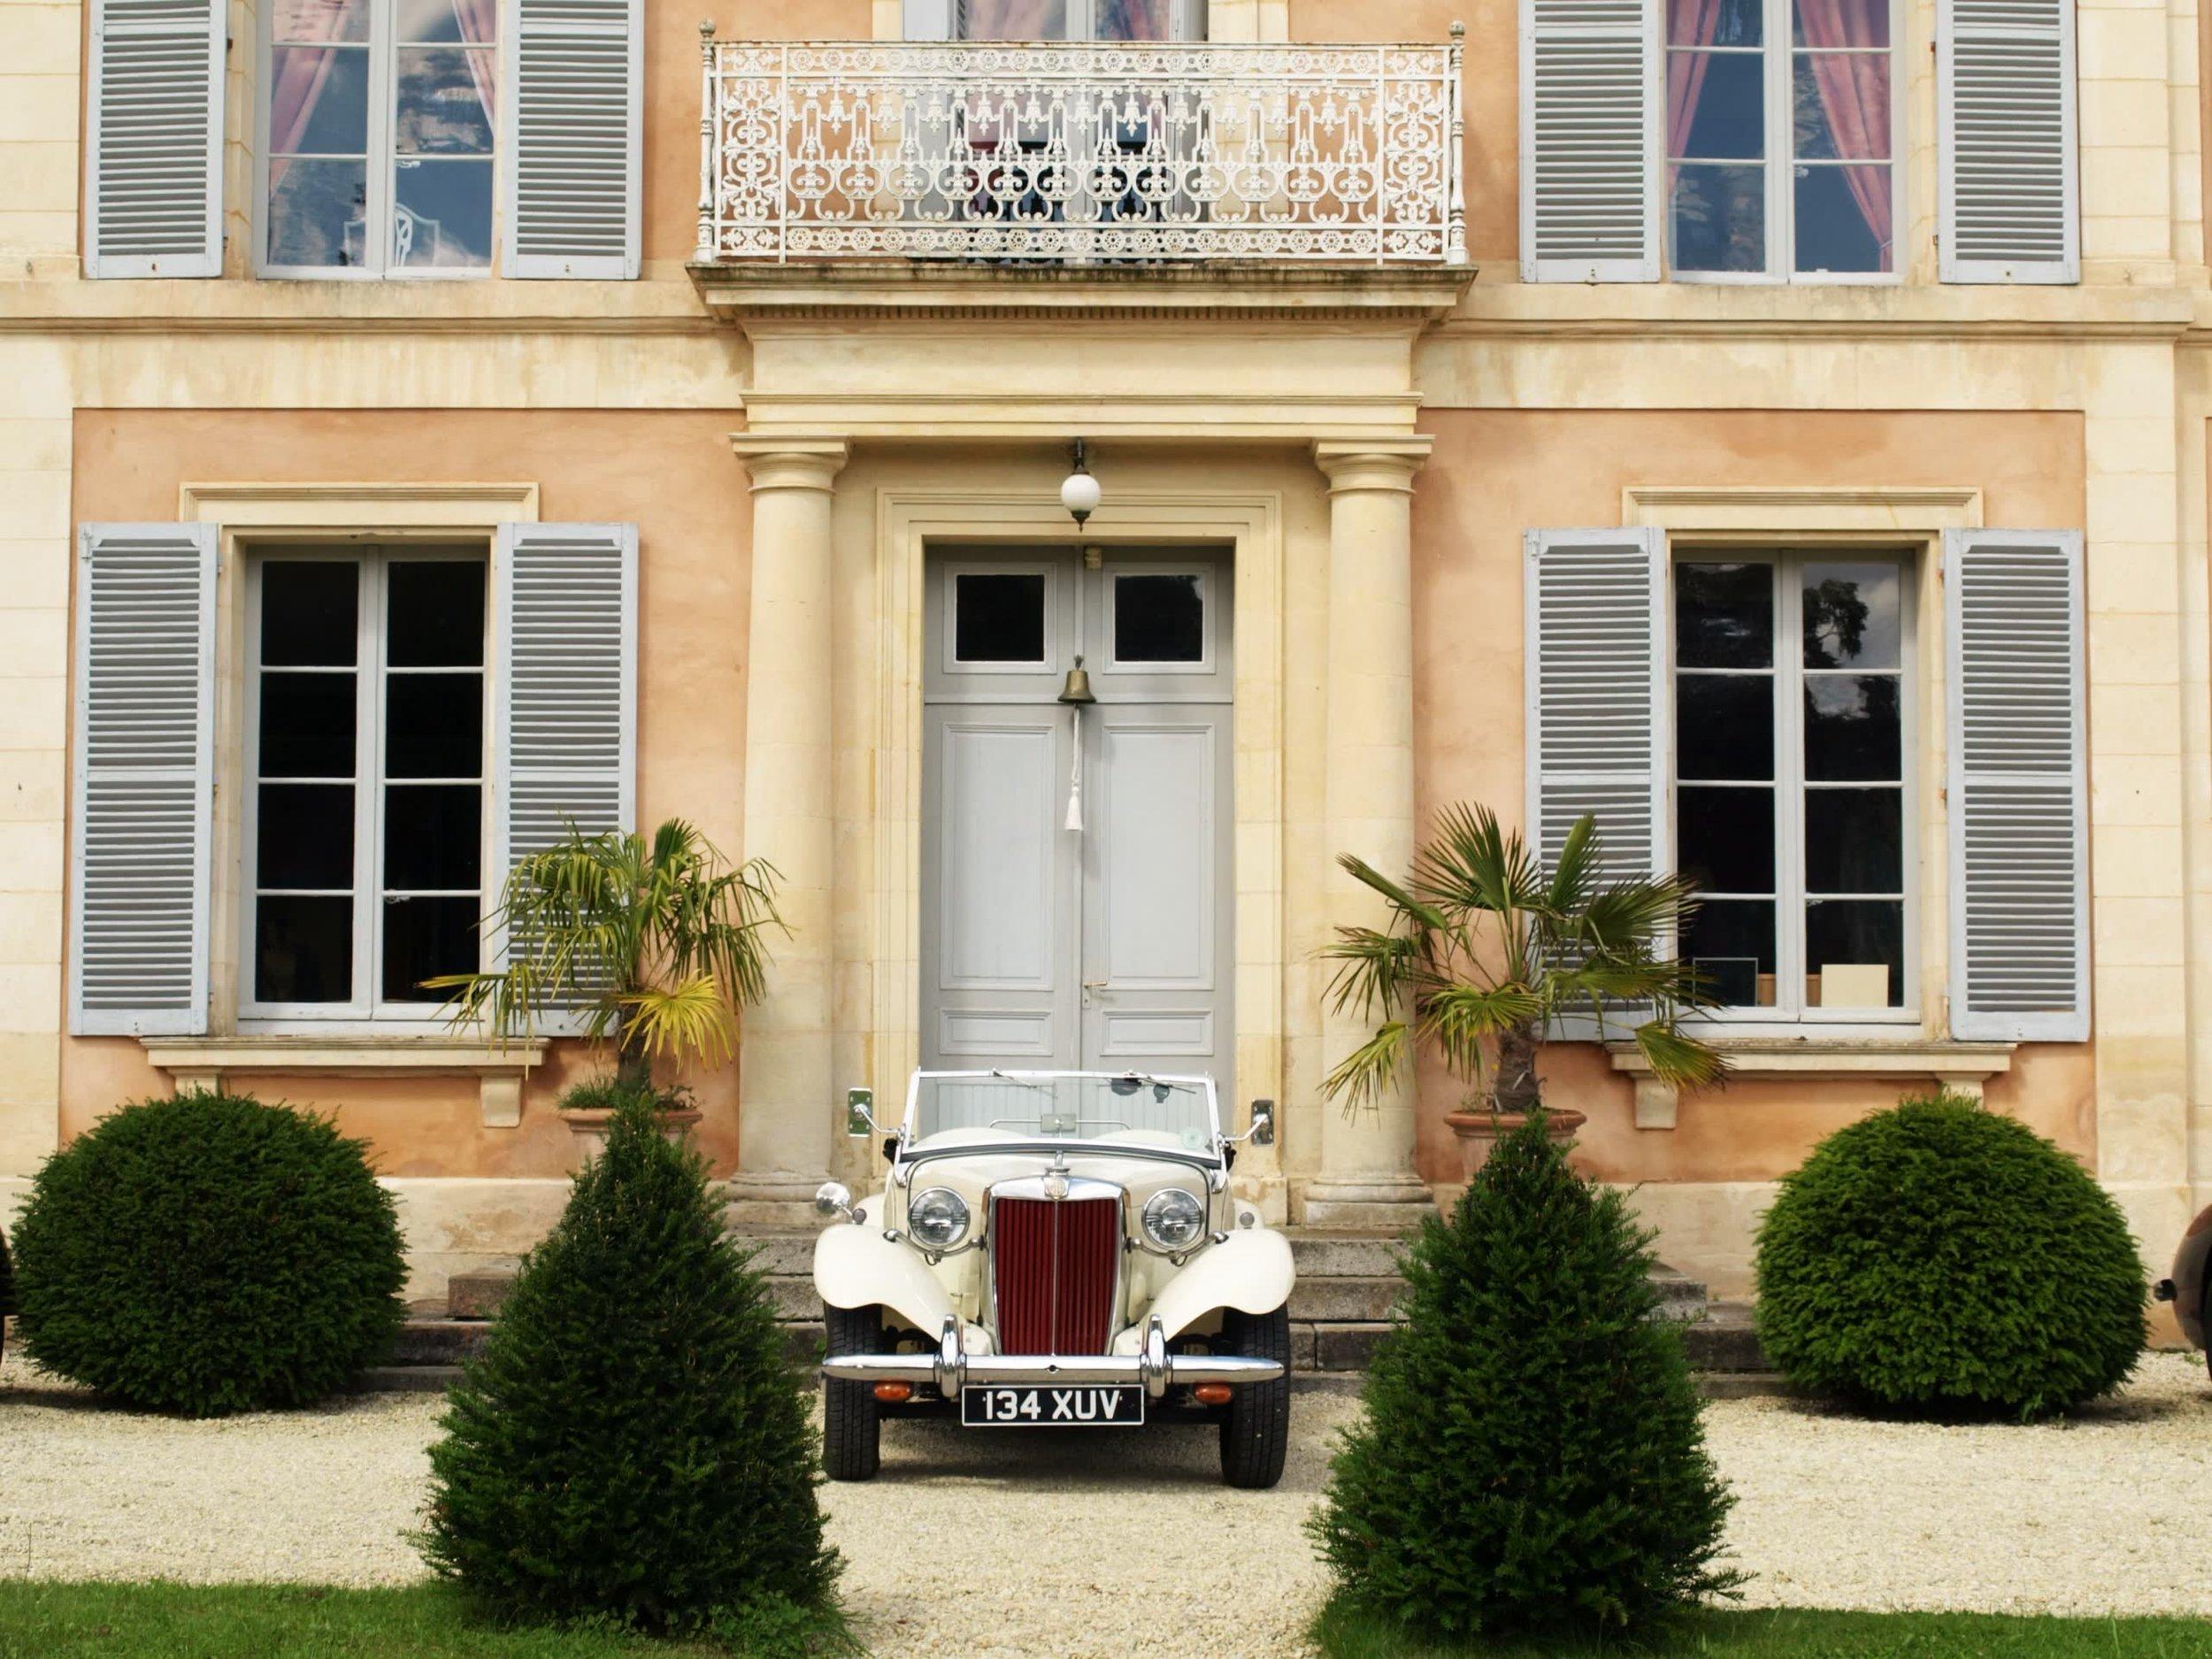 Chateau de la Pommeraye - charming boutique hotel chateau b&b spa normandy calvados 4(2).jpg